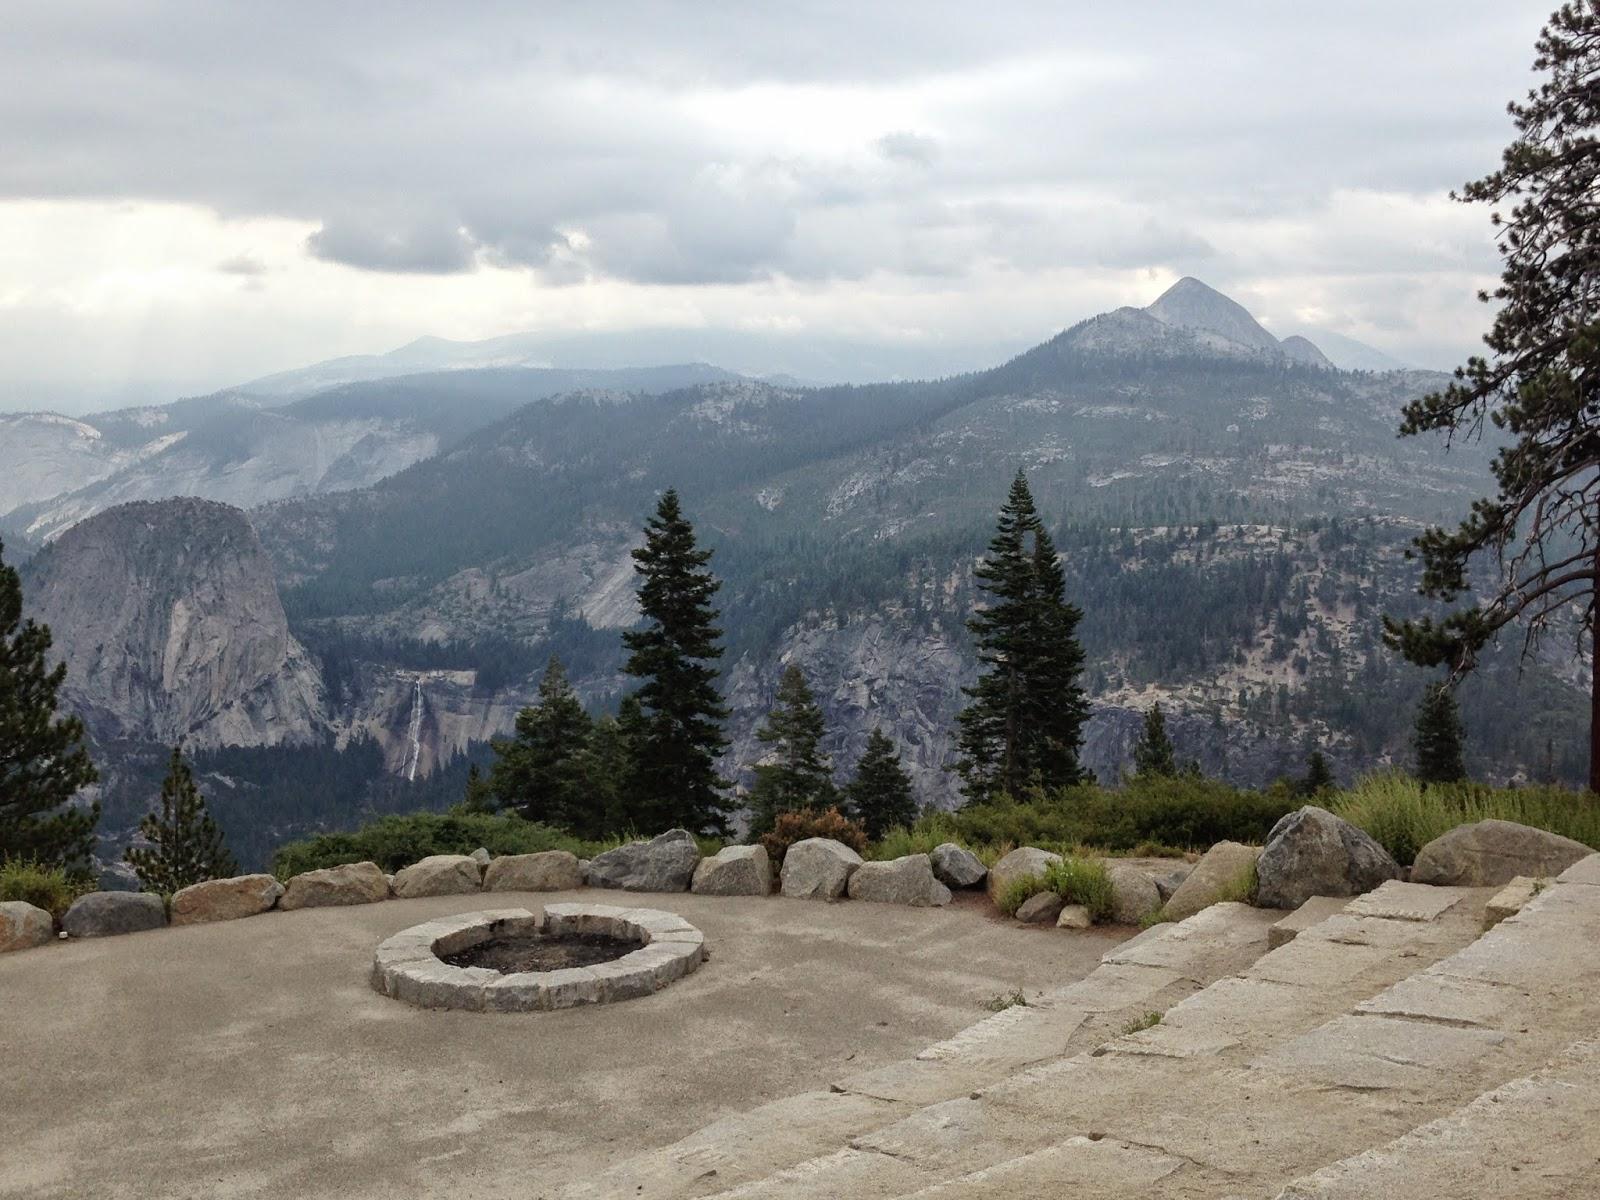 John Muir Trail 2014 Jmt Hiking Day 1 Glacier Point To